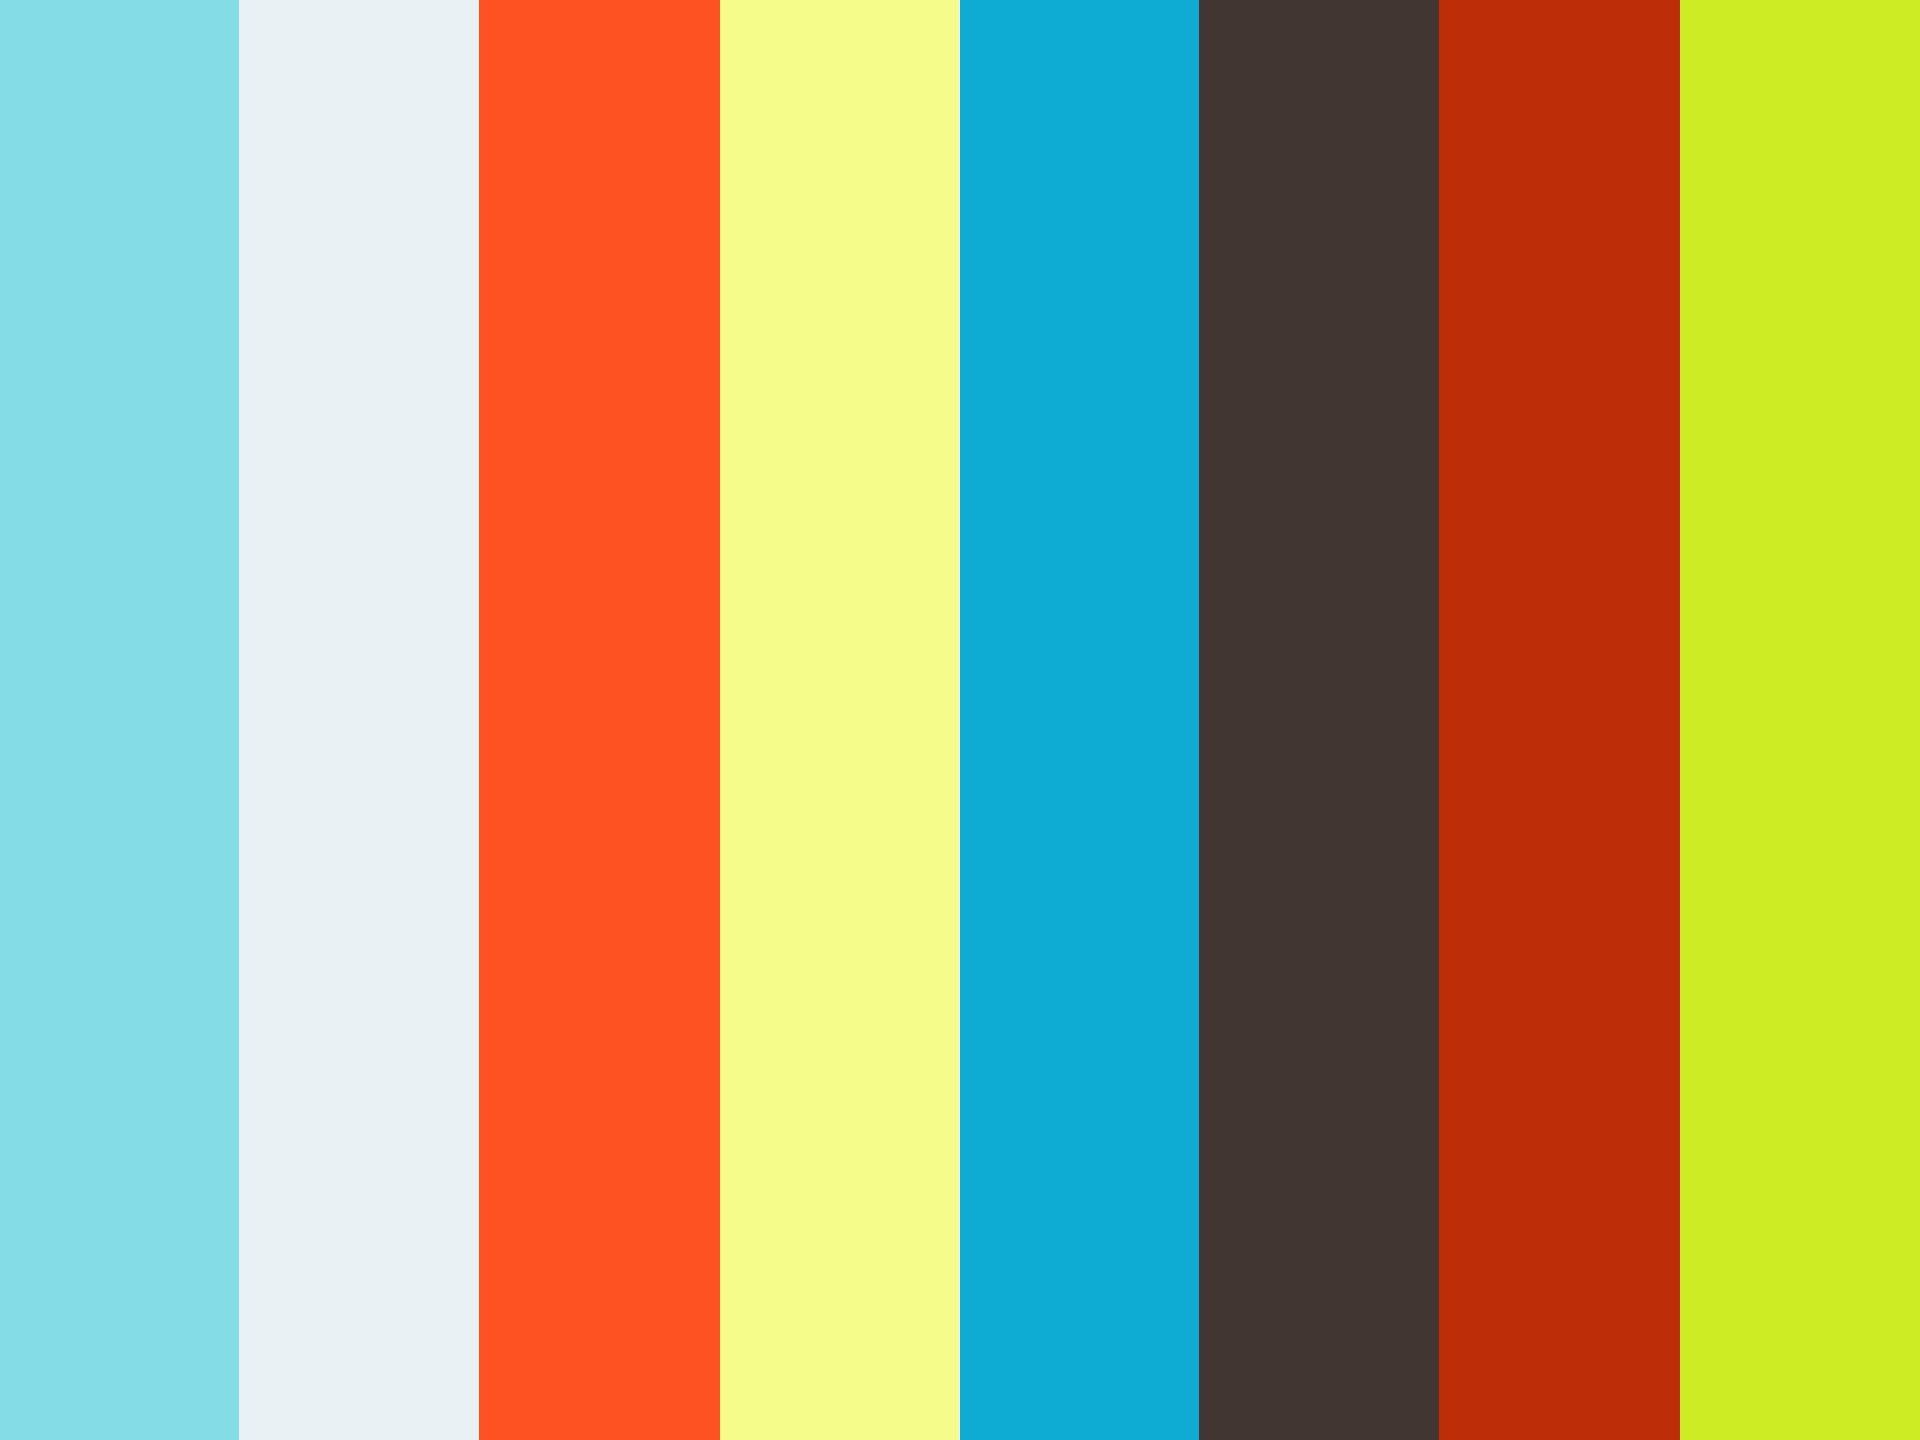 【Nex】八木洋二郎先生 : ダイレクトボンデットレストレーション #2